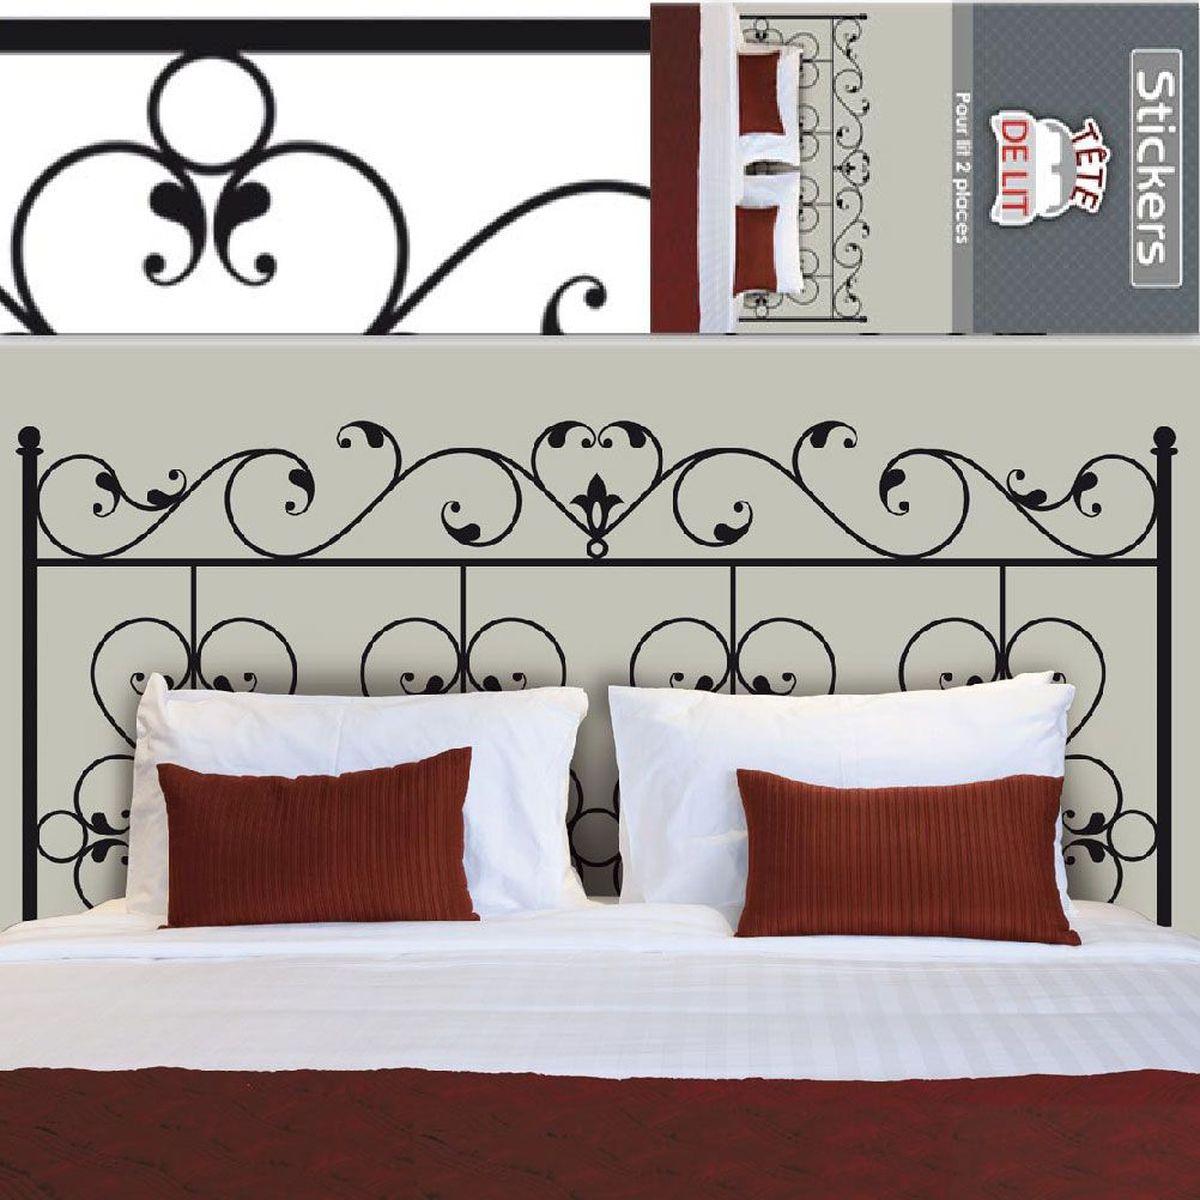 sticker mural t te de lit fer forg 155 x 68 cm. Black Bedroom Furniture Sets. Home Design Ideas